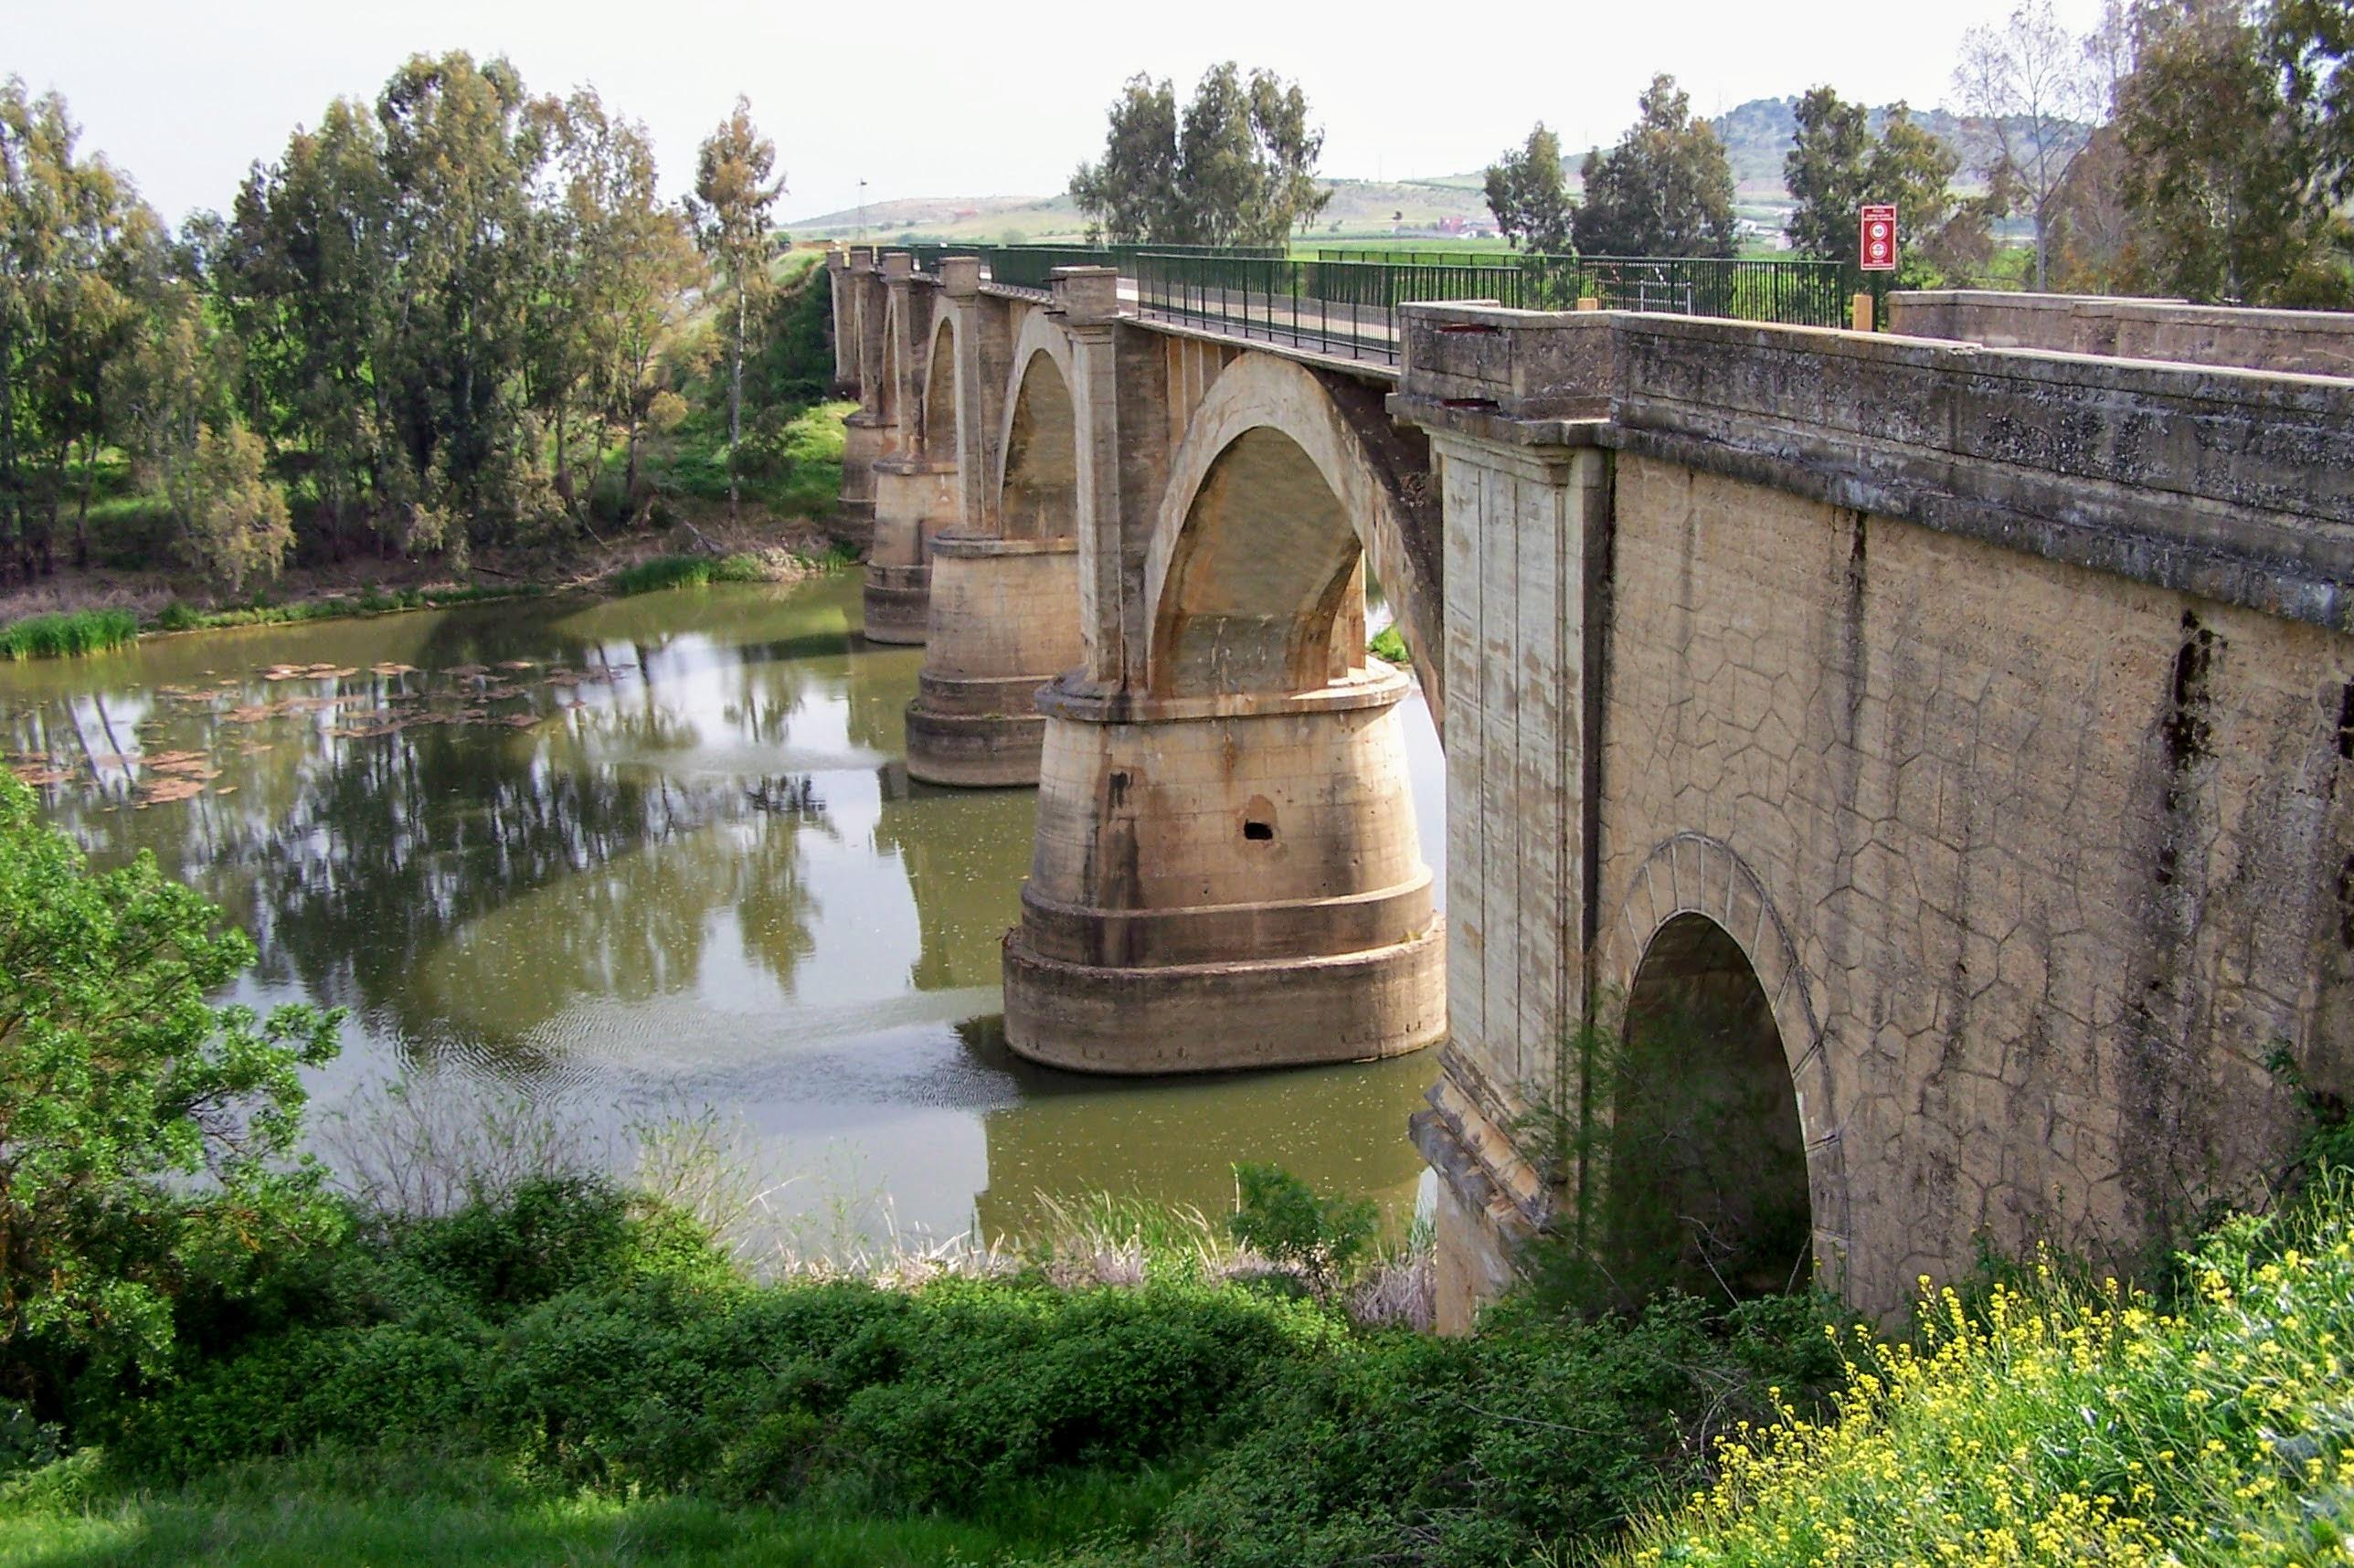 Camino_natural_vegas_del_guadiana_2